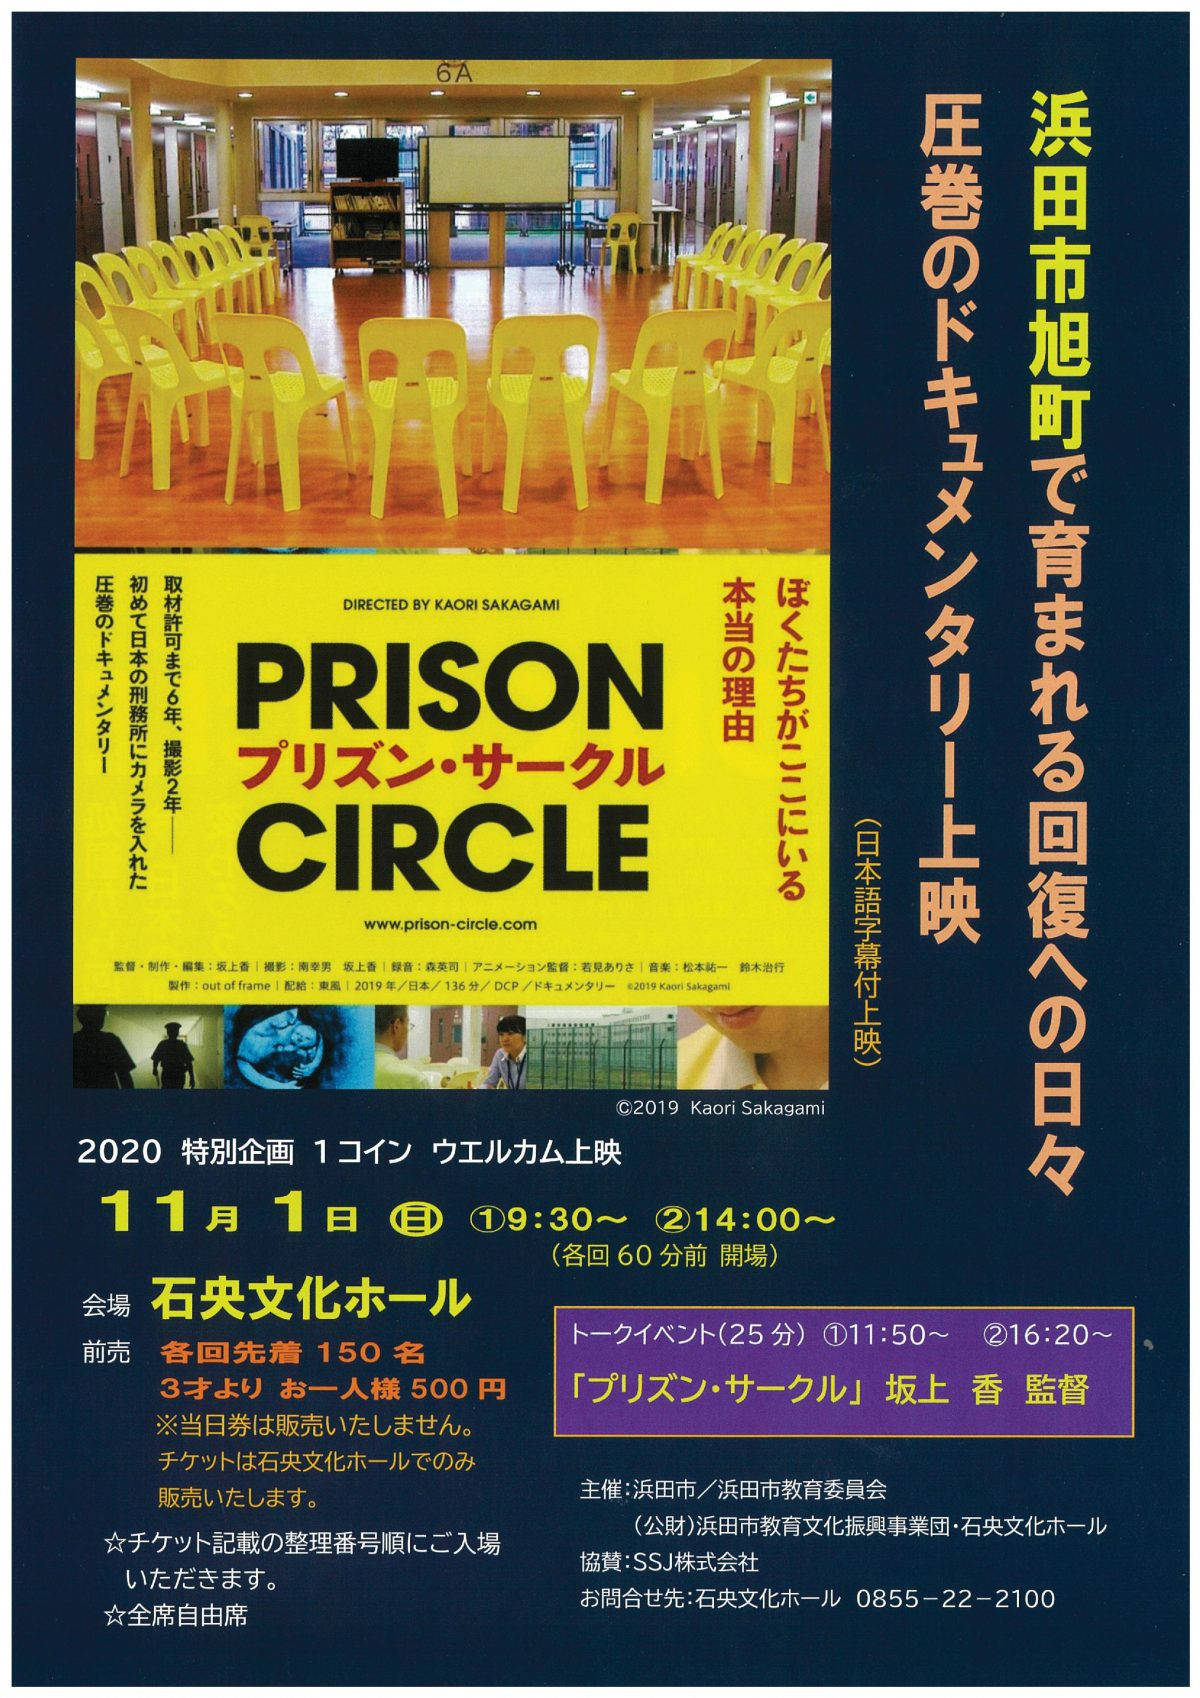 PRISON CIRCLE(プリズン・サークル)ドキュメンタリー上映